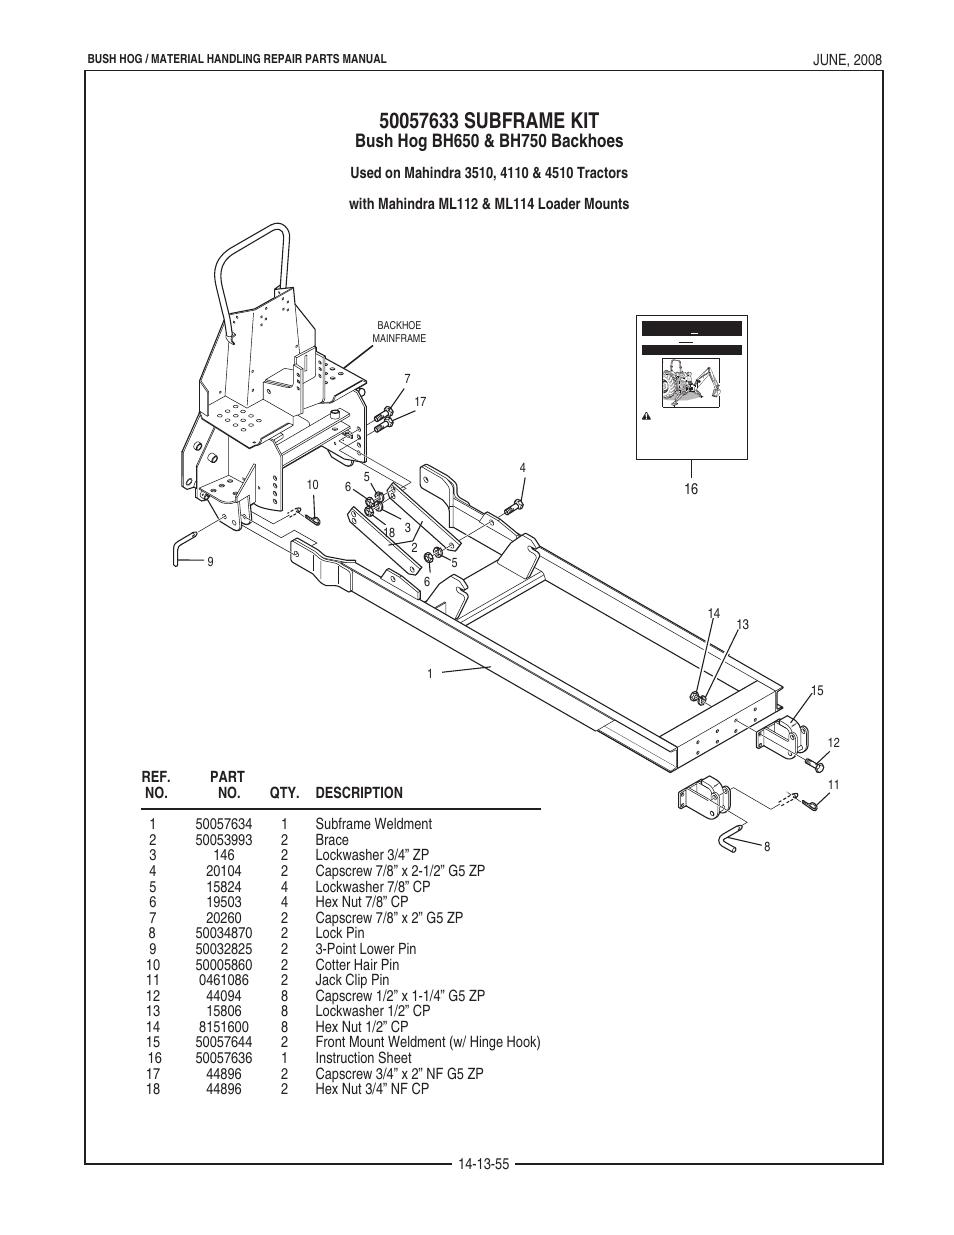 Bush Hog Schematics | Repair Manual Mahindra Wiring Diagram on